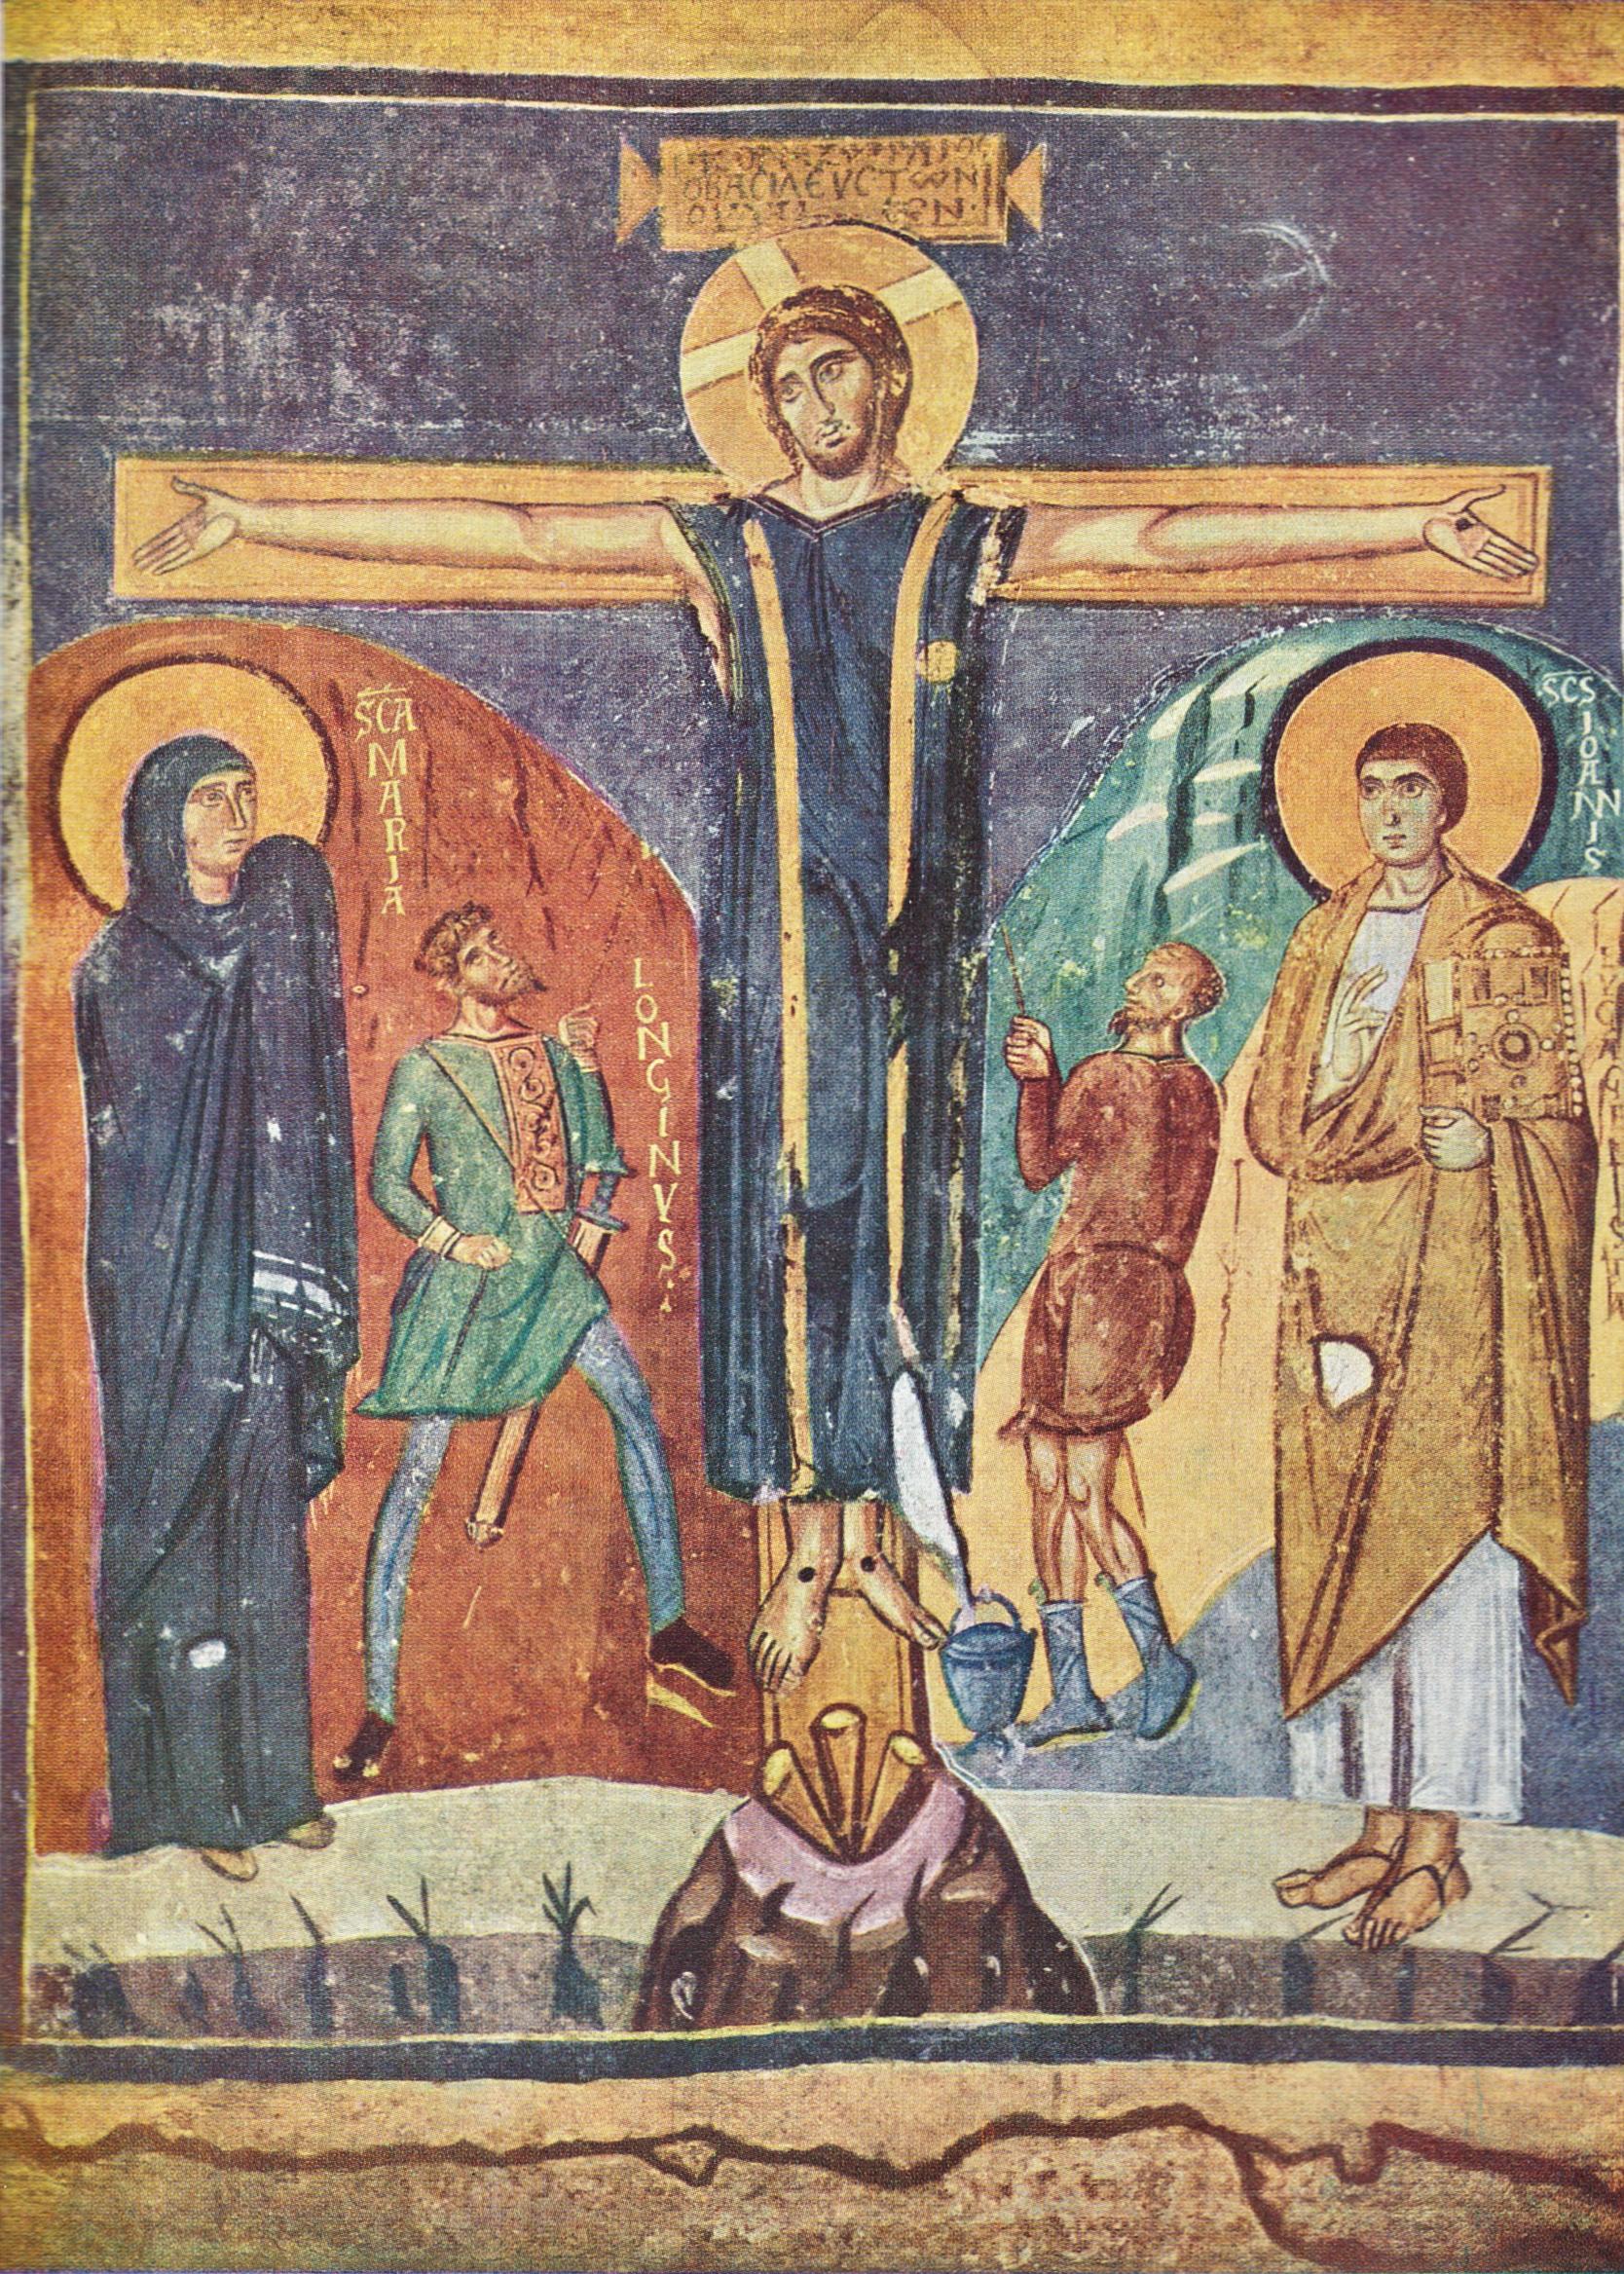 8th century fresco painting of the Crucifixion from Santa Maria Antiqua, Rome.